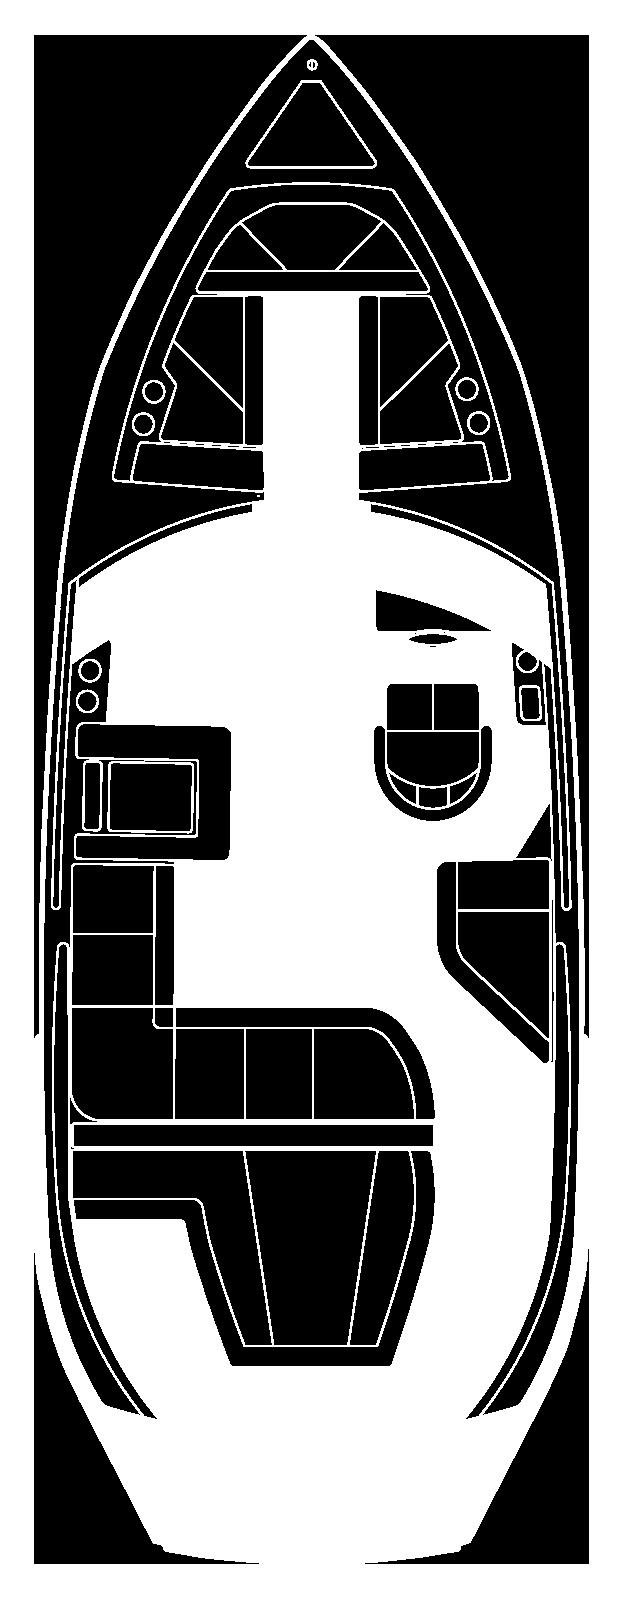 CS23 Floorplan